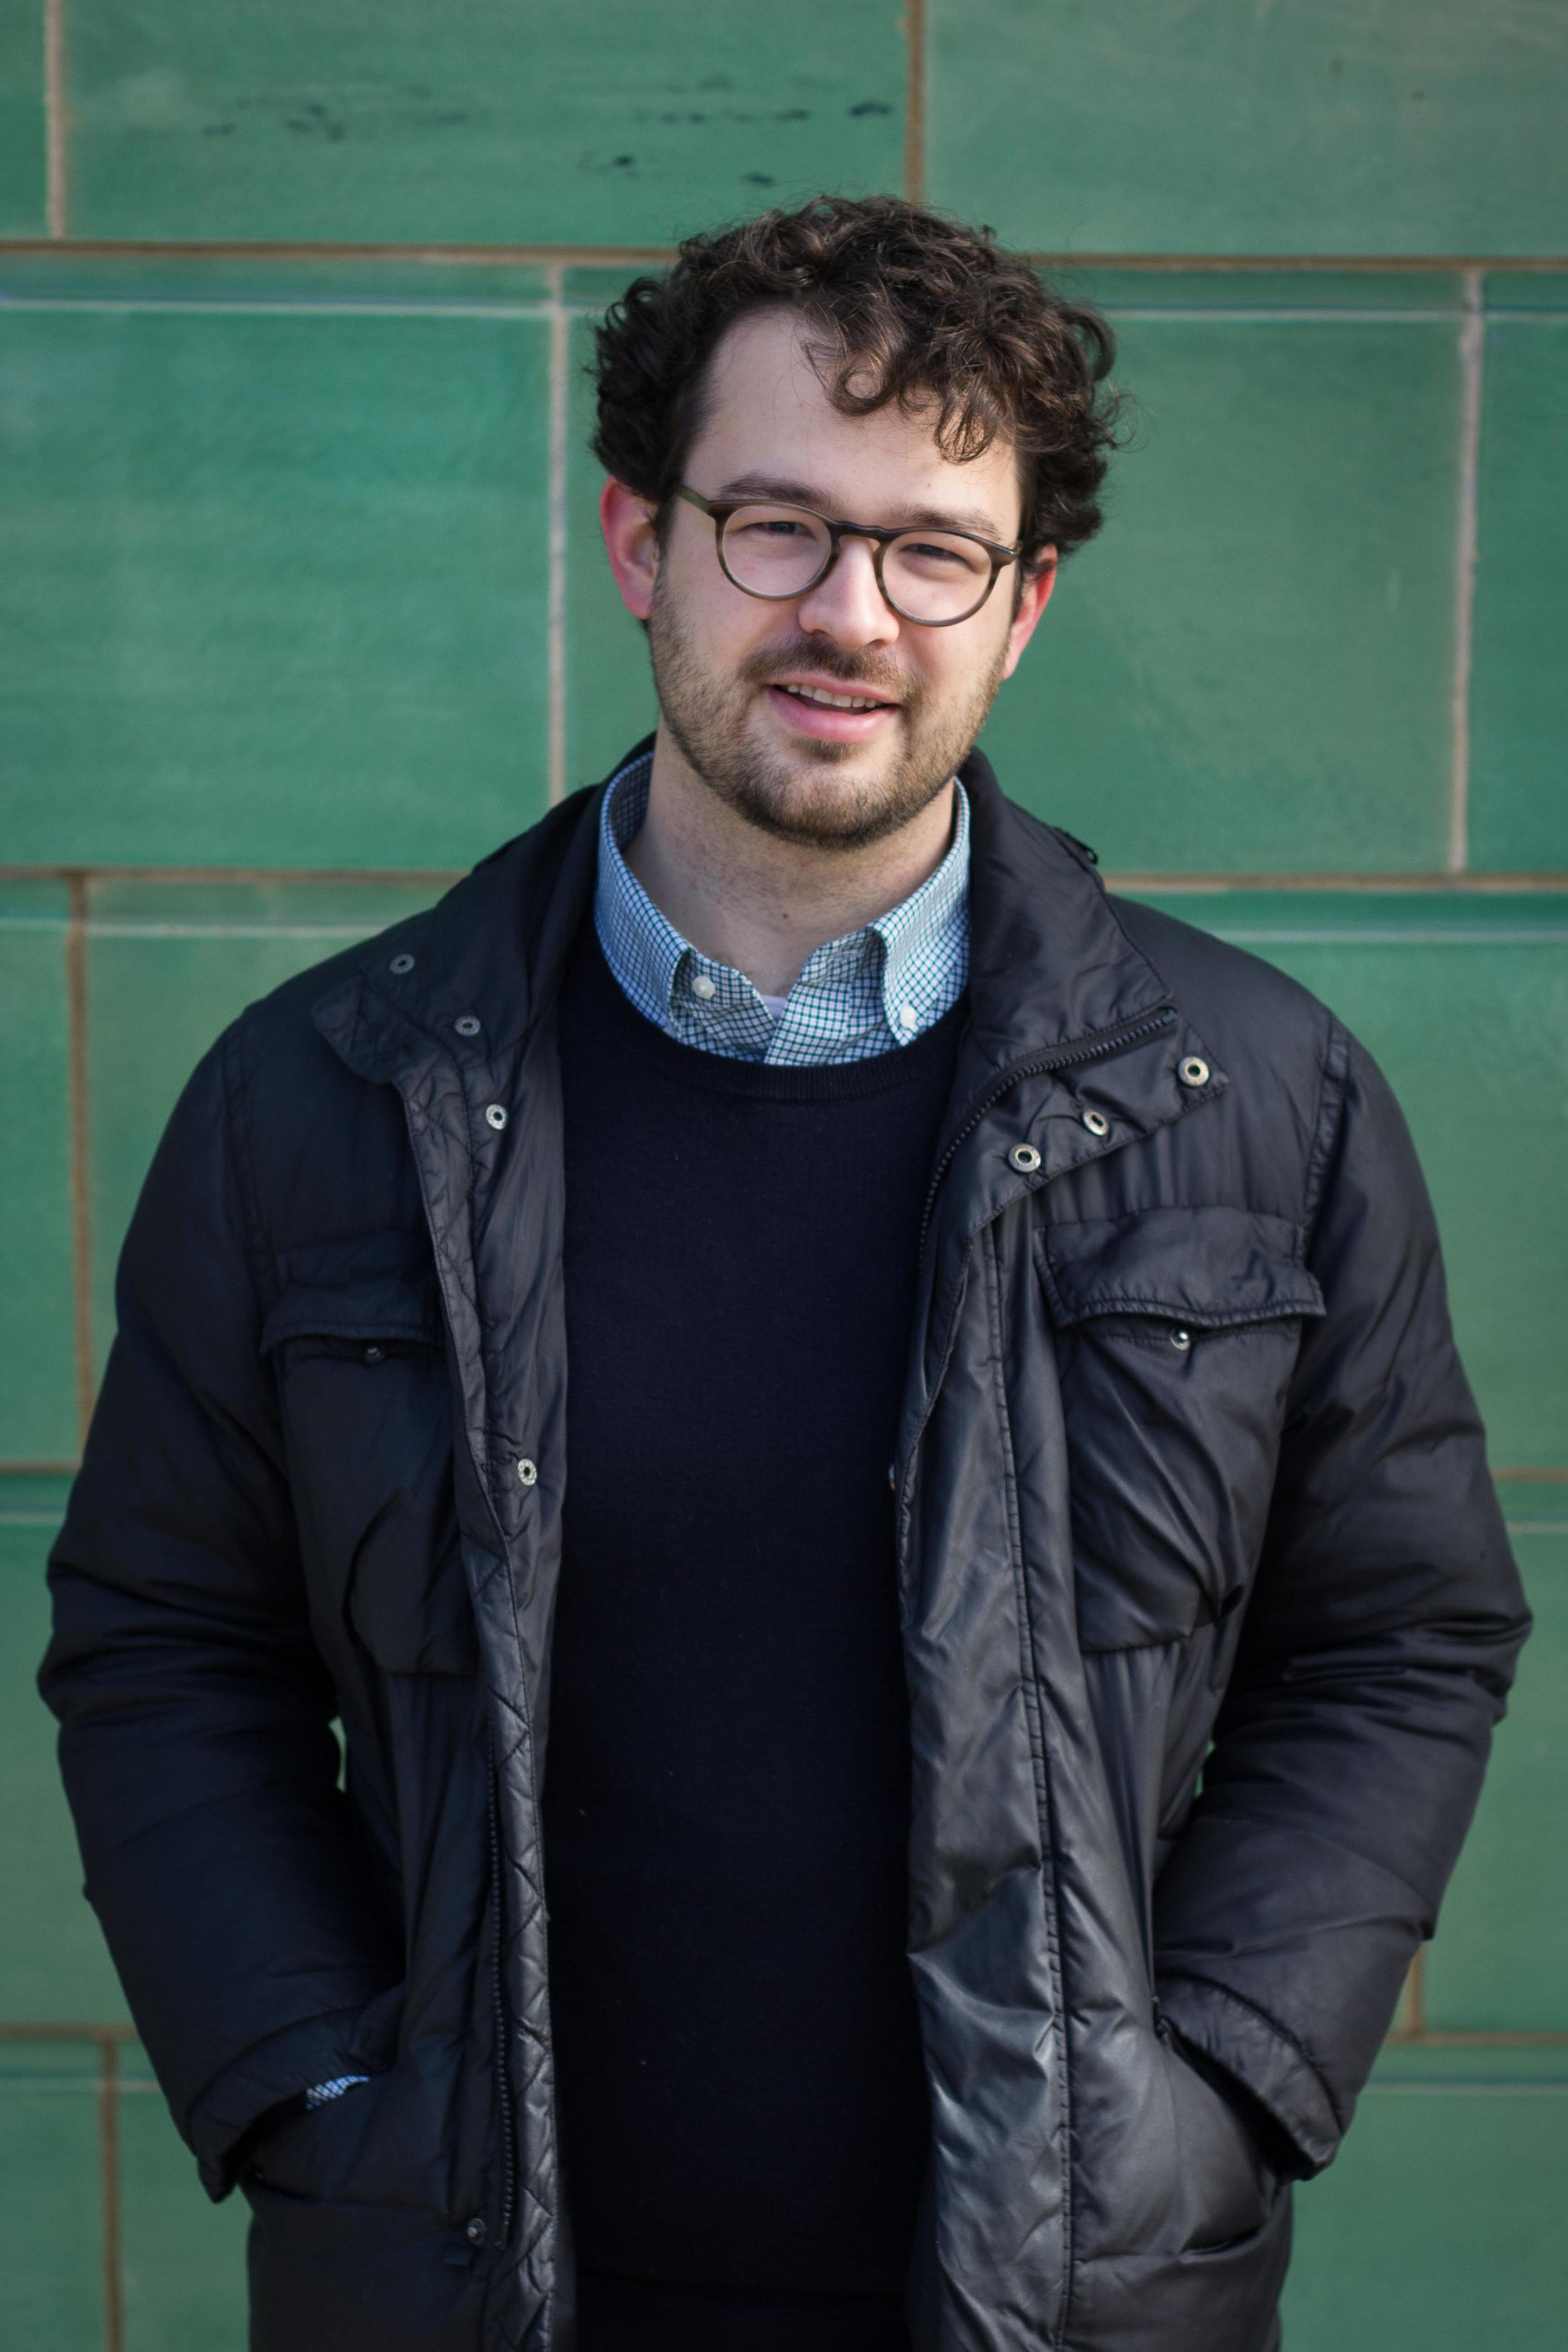 Daniel K. Hertz